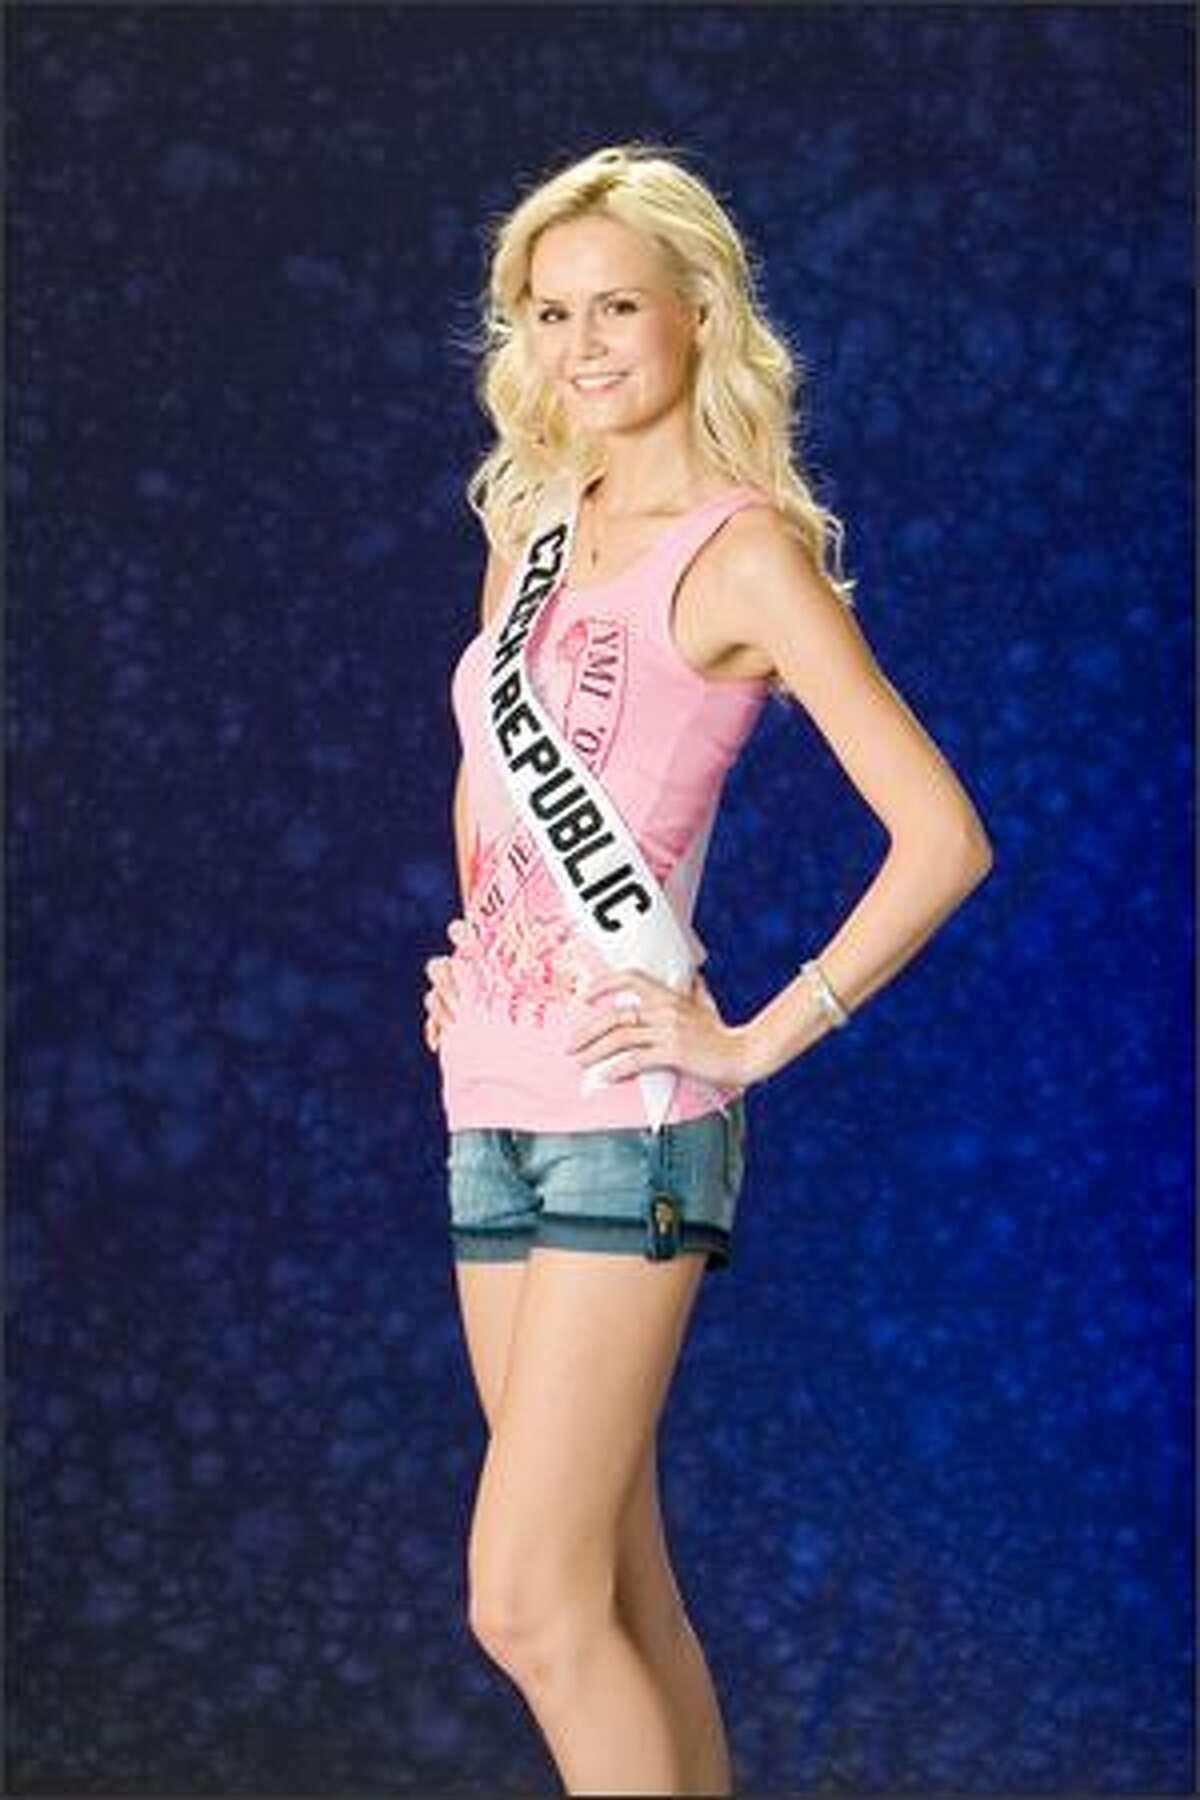 Lucie Hadasova, Miss Czech Republic 2007.